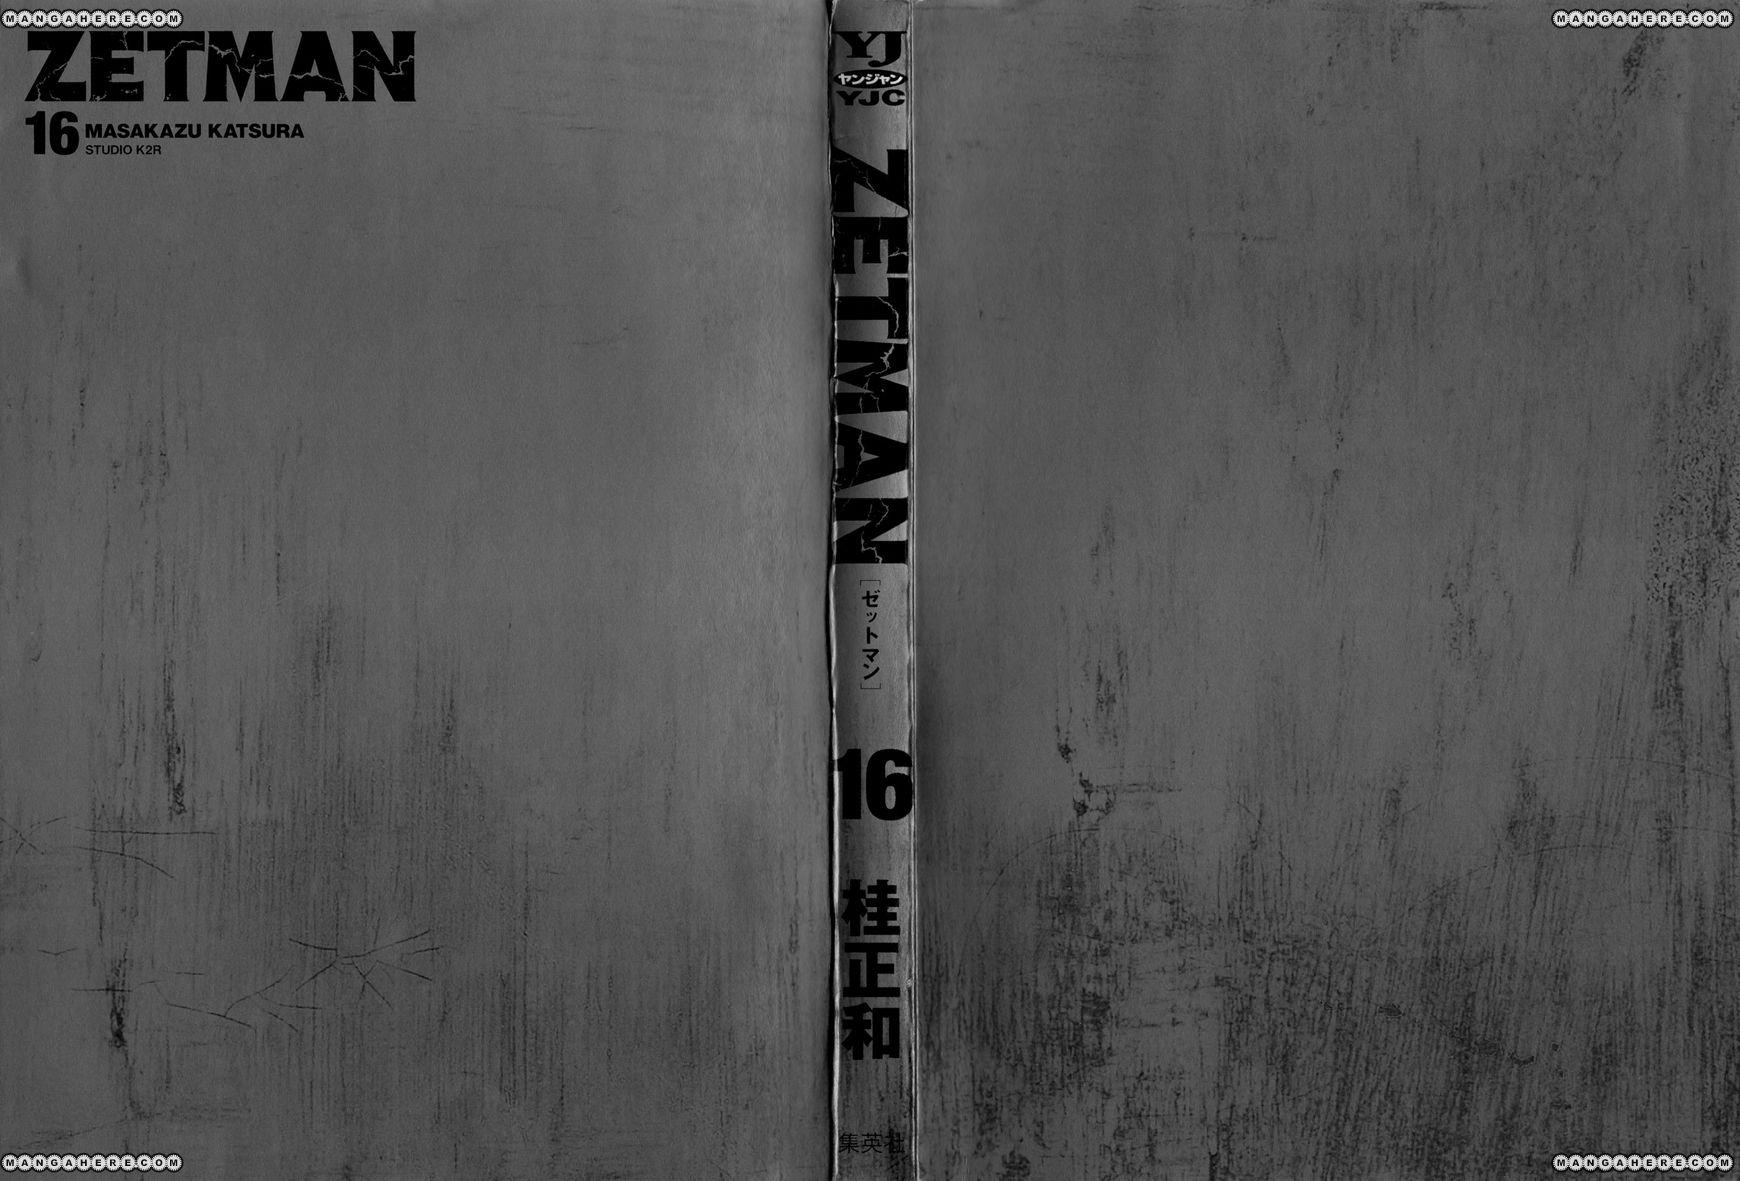 Zetman 178 Page 3